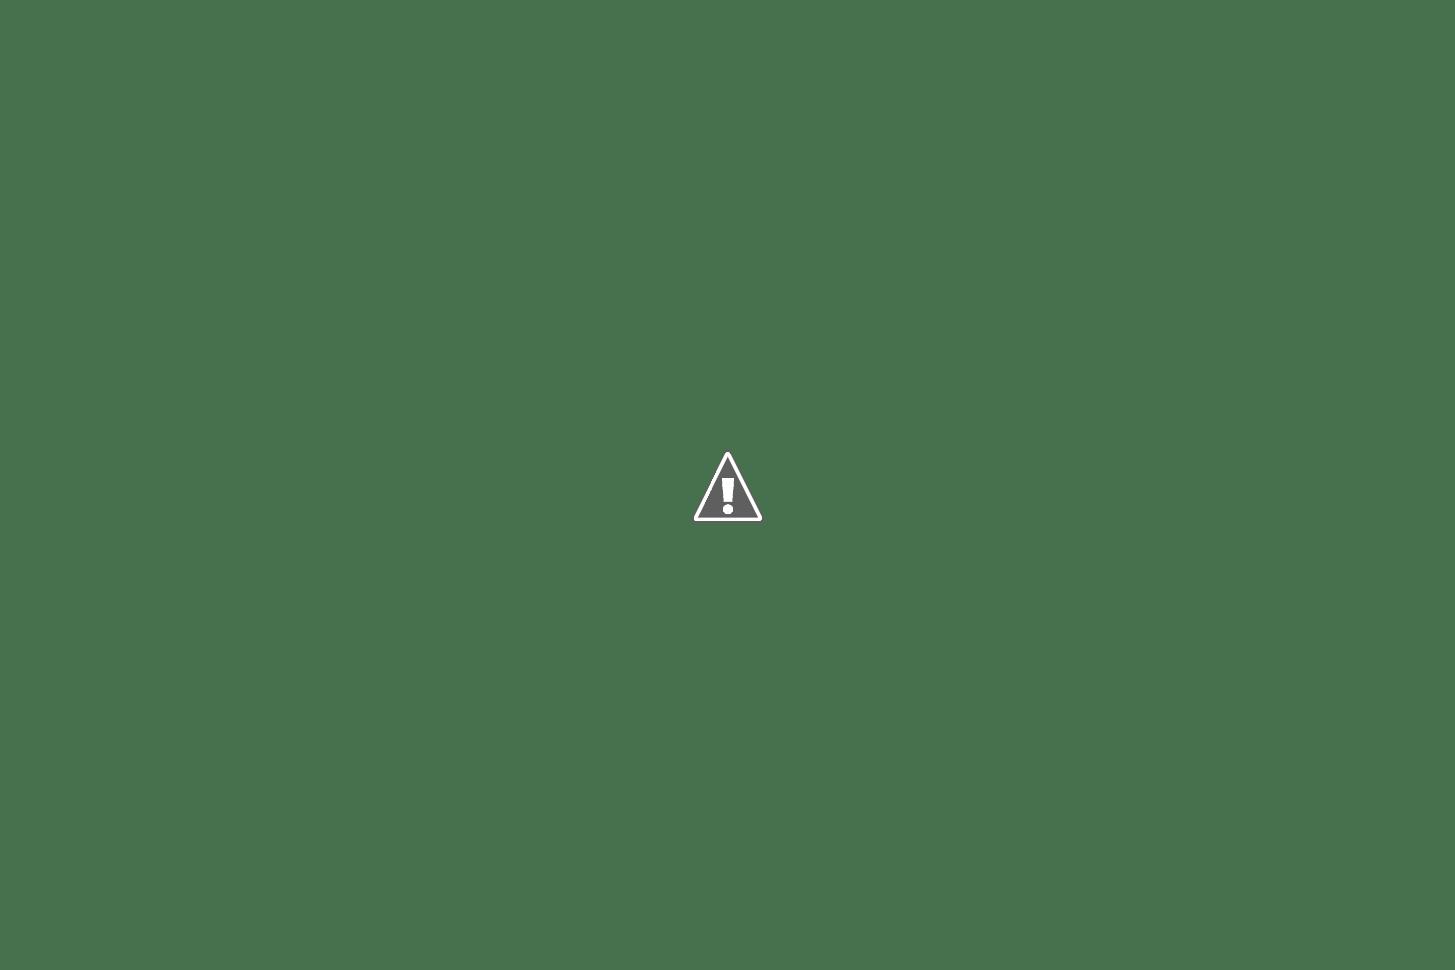 ZX7025 lắp mũi phay mặt